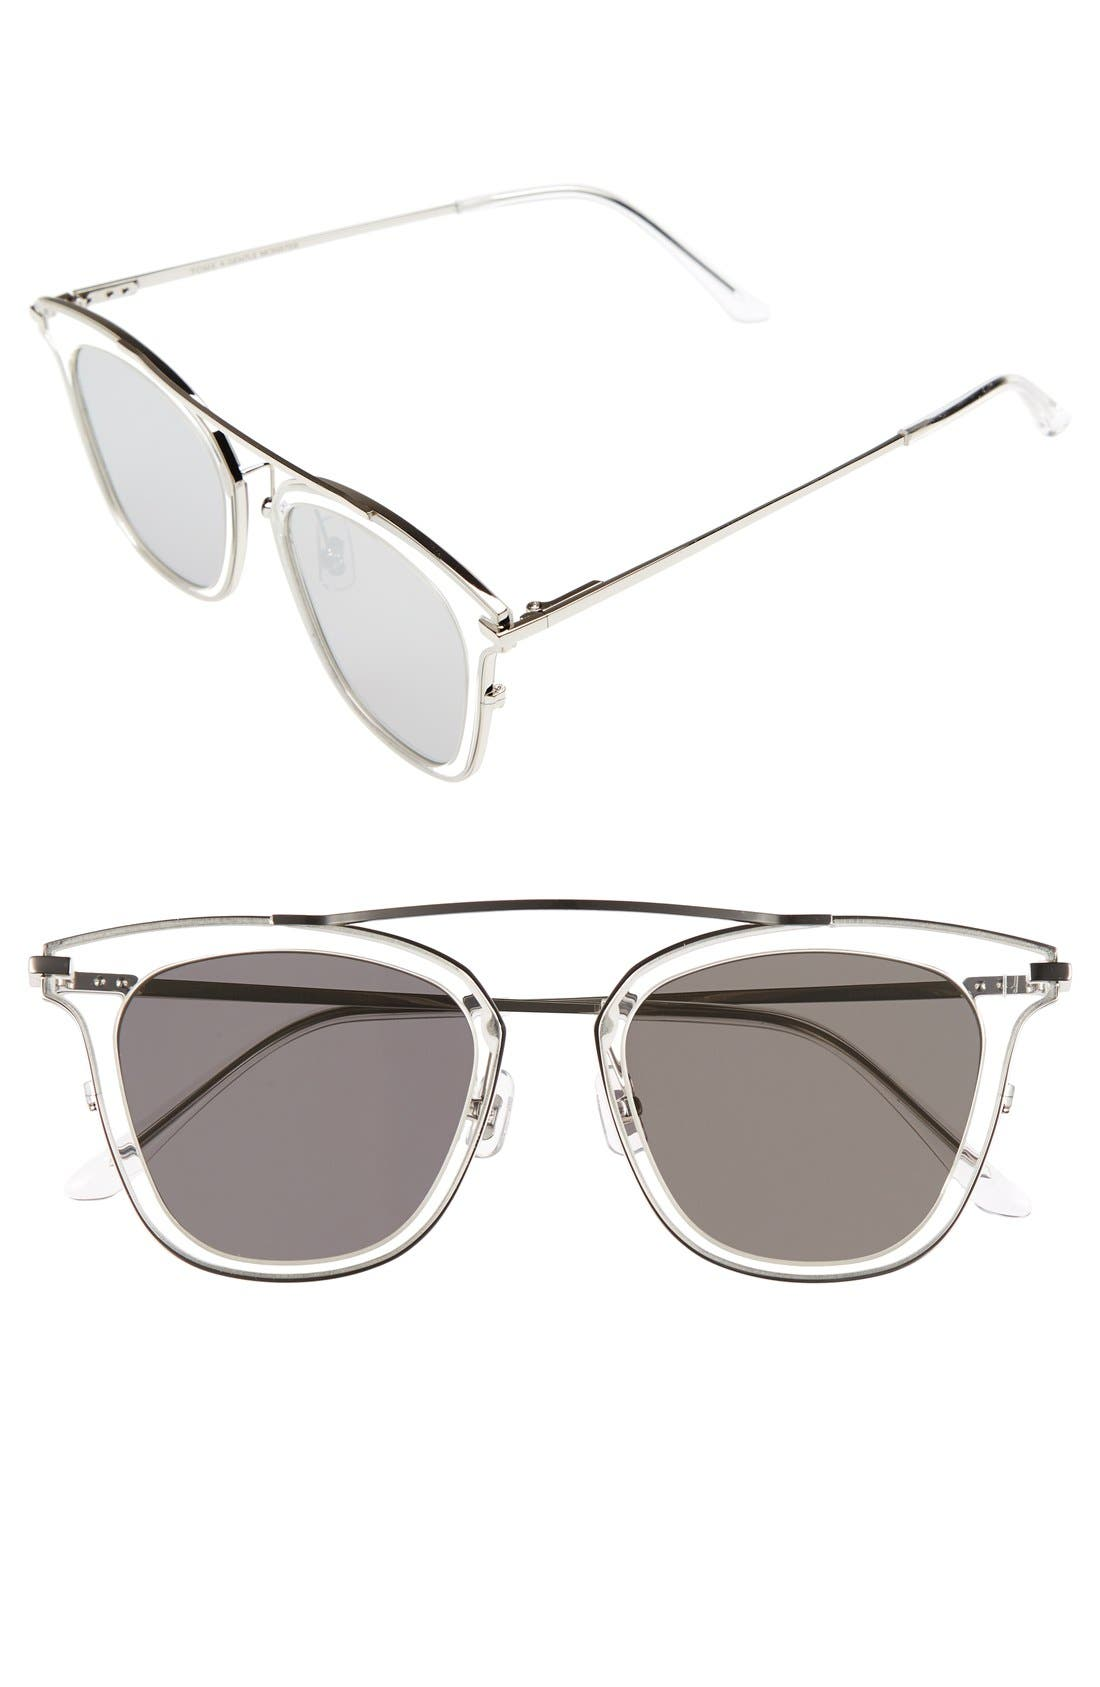 GENTLE MONSTER TOME x Gentle Monster Supernature 51mm Retro Sunglasses